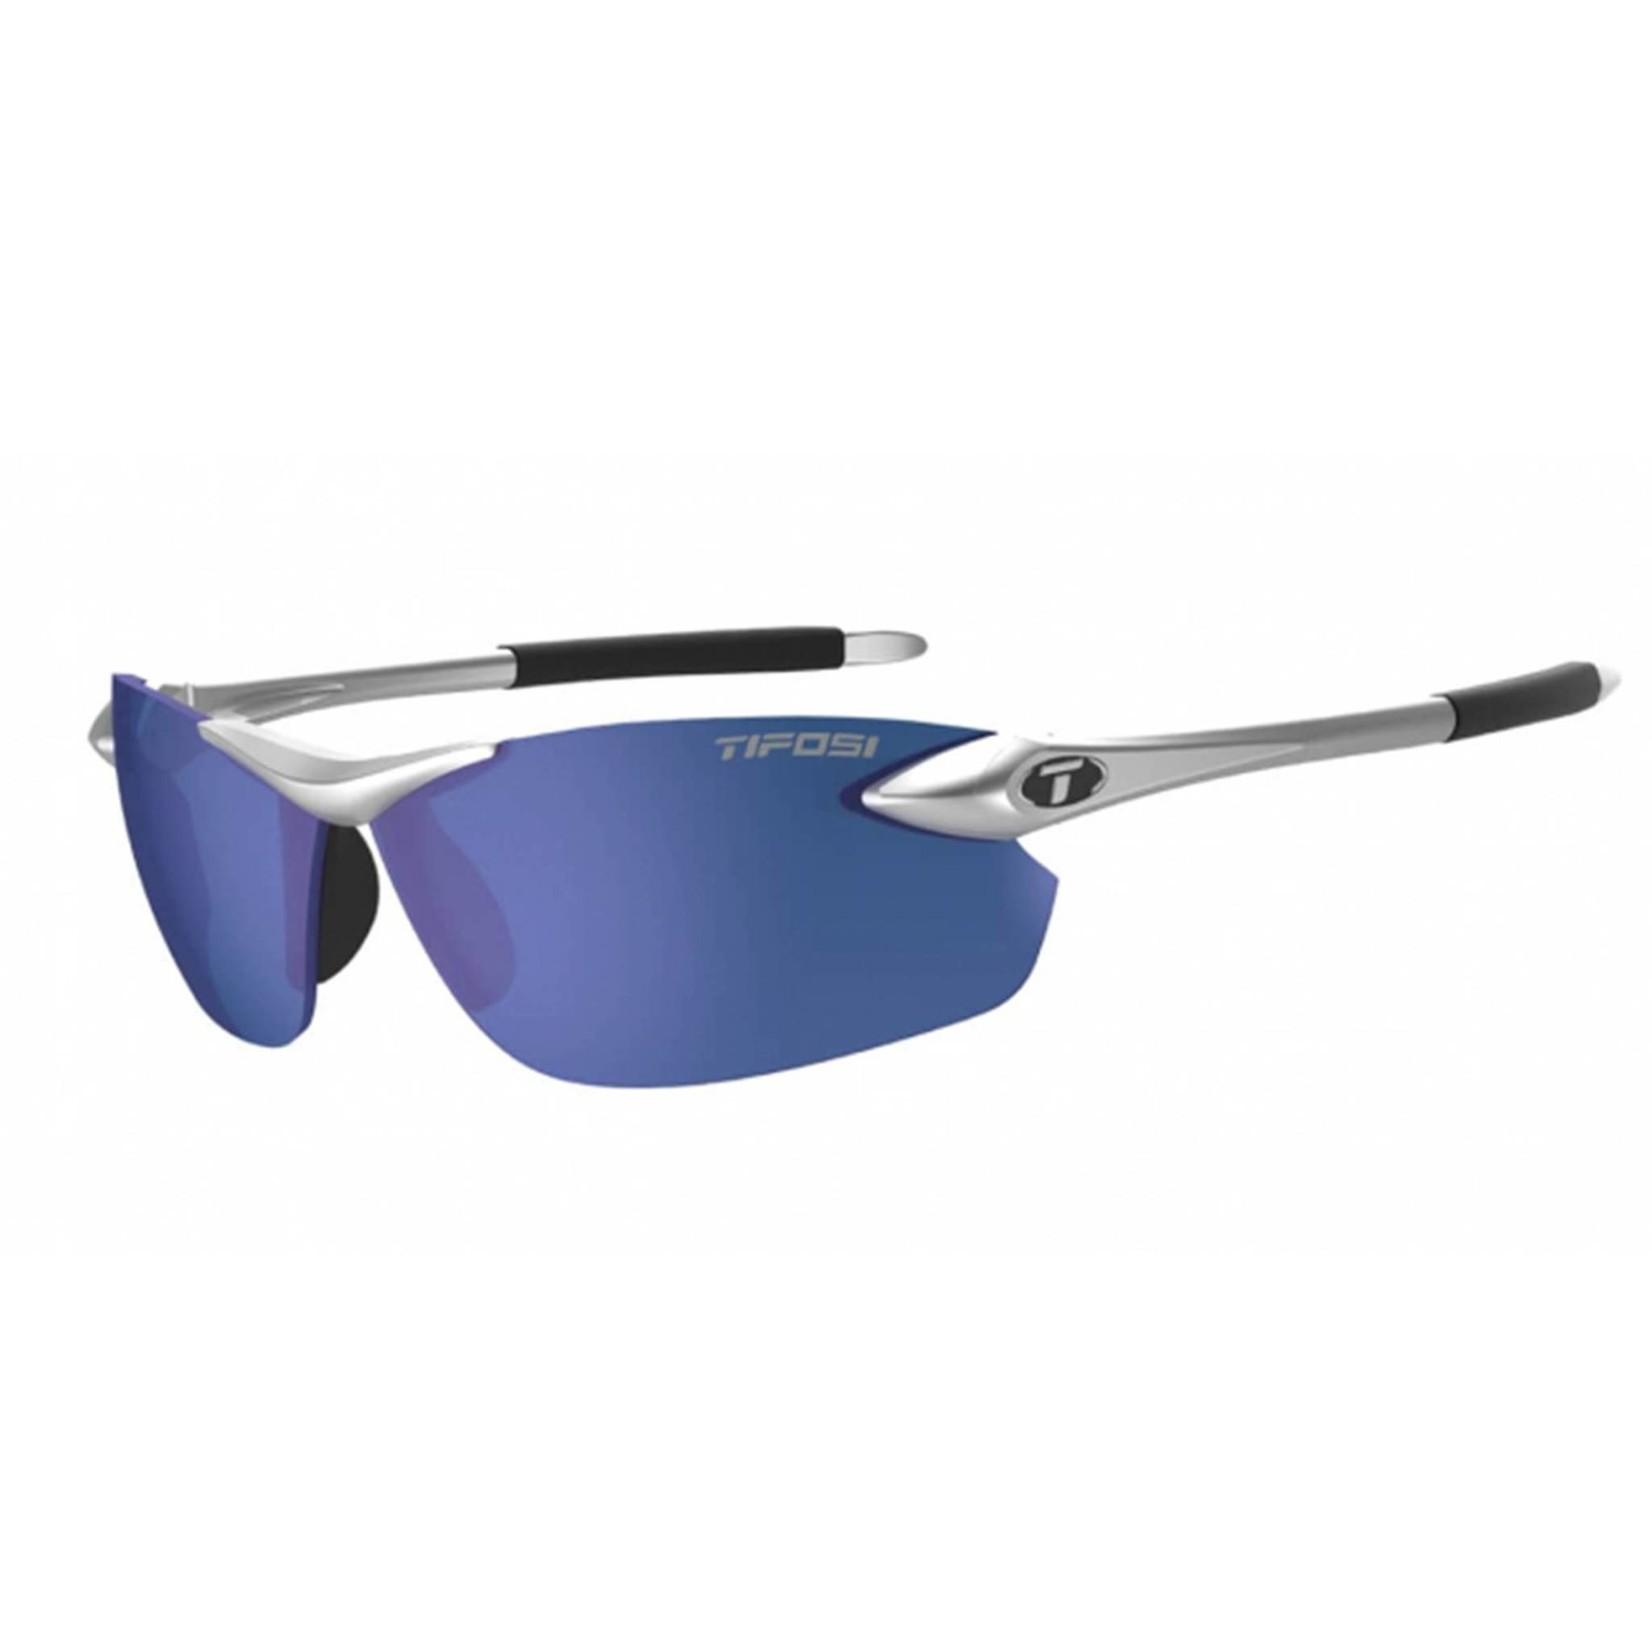 Tifosi Seek FC Sunglasses Silver